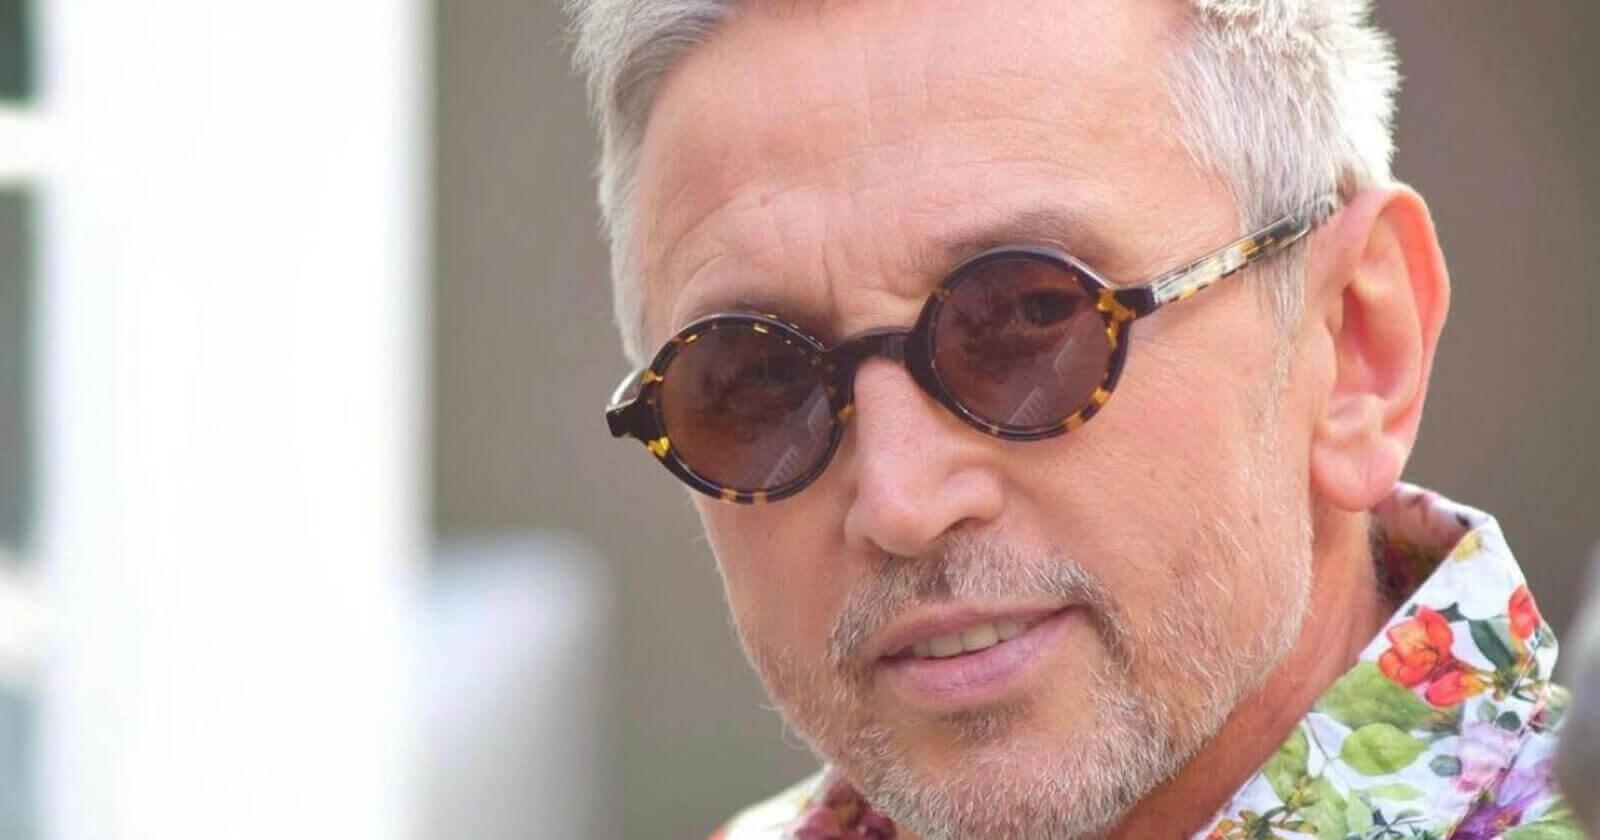 Chi è Bruno Barbieri: Biografia, Età, Moglie, Ristorante e 4 Hotel